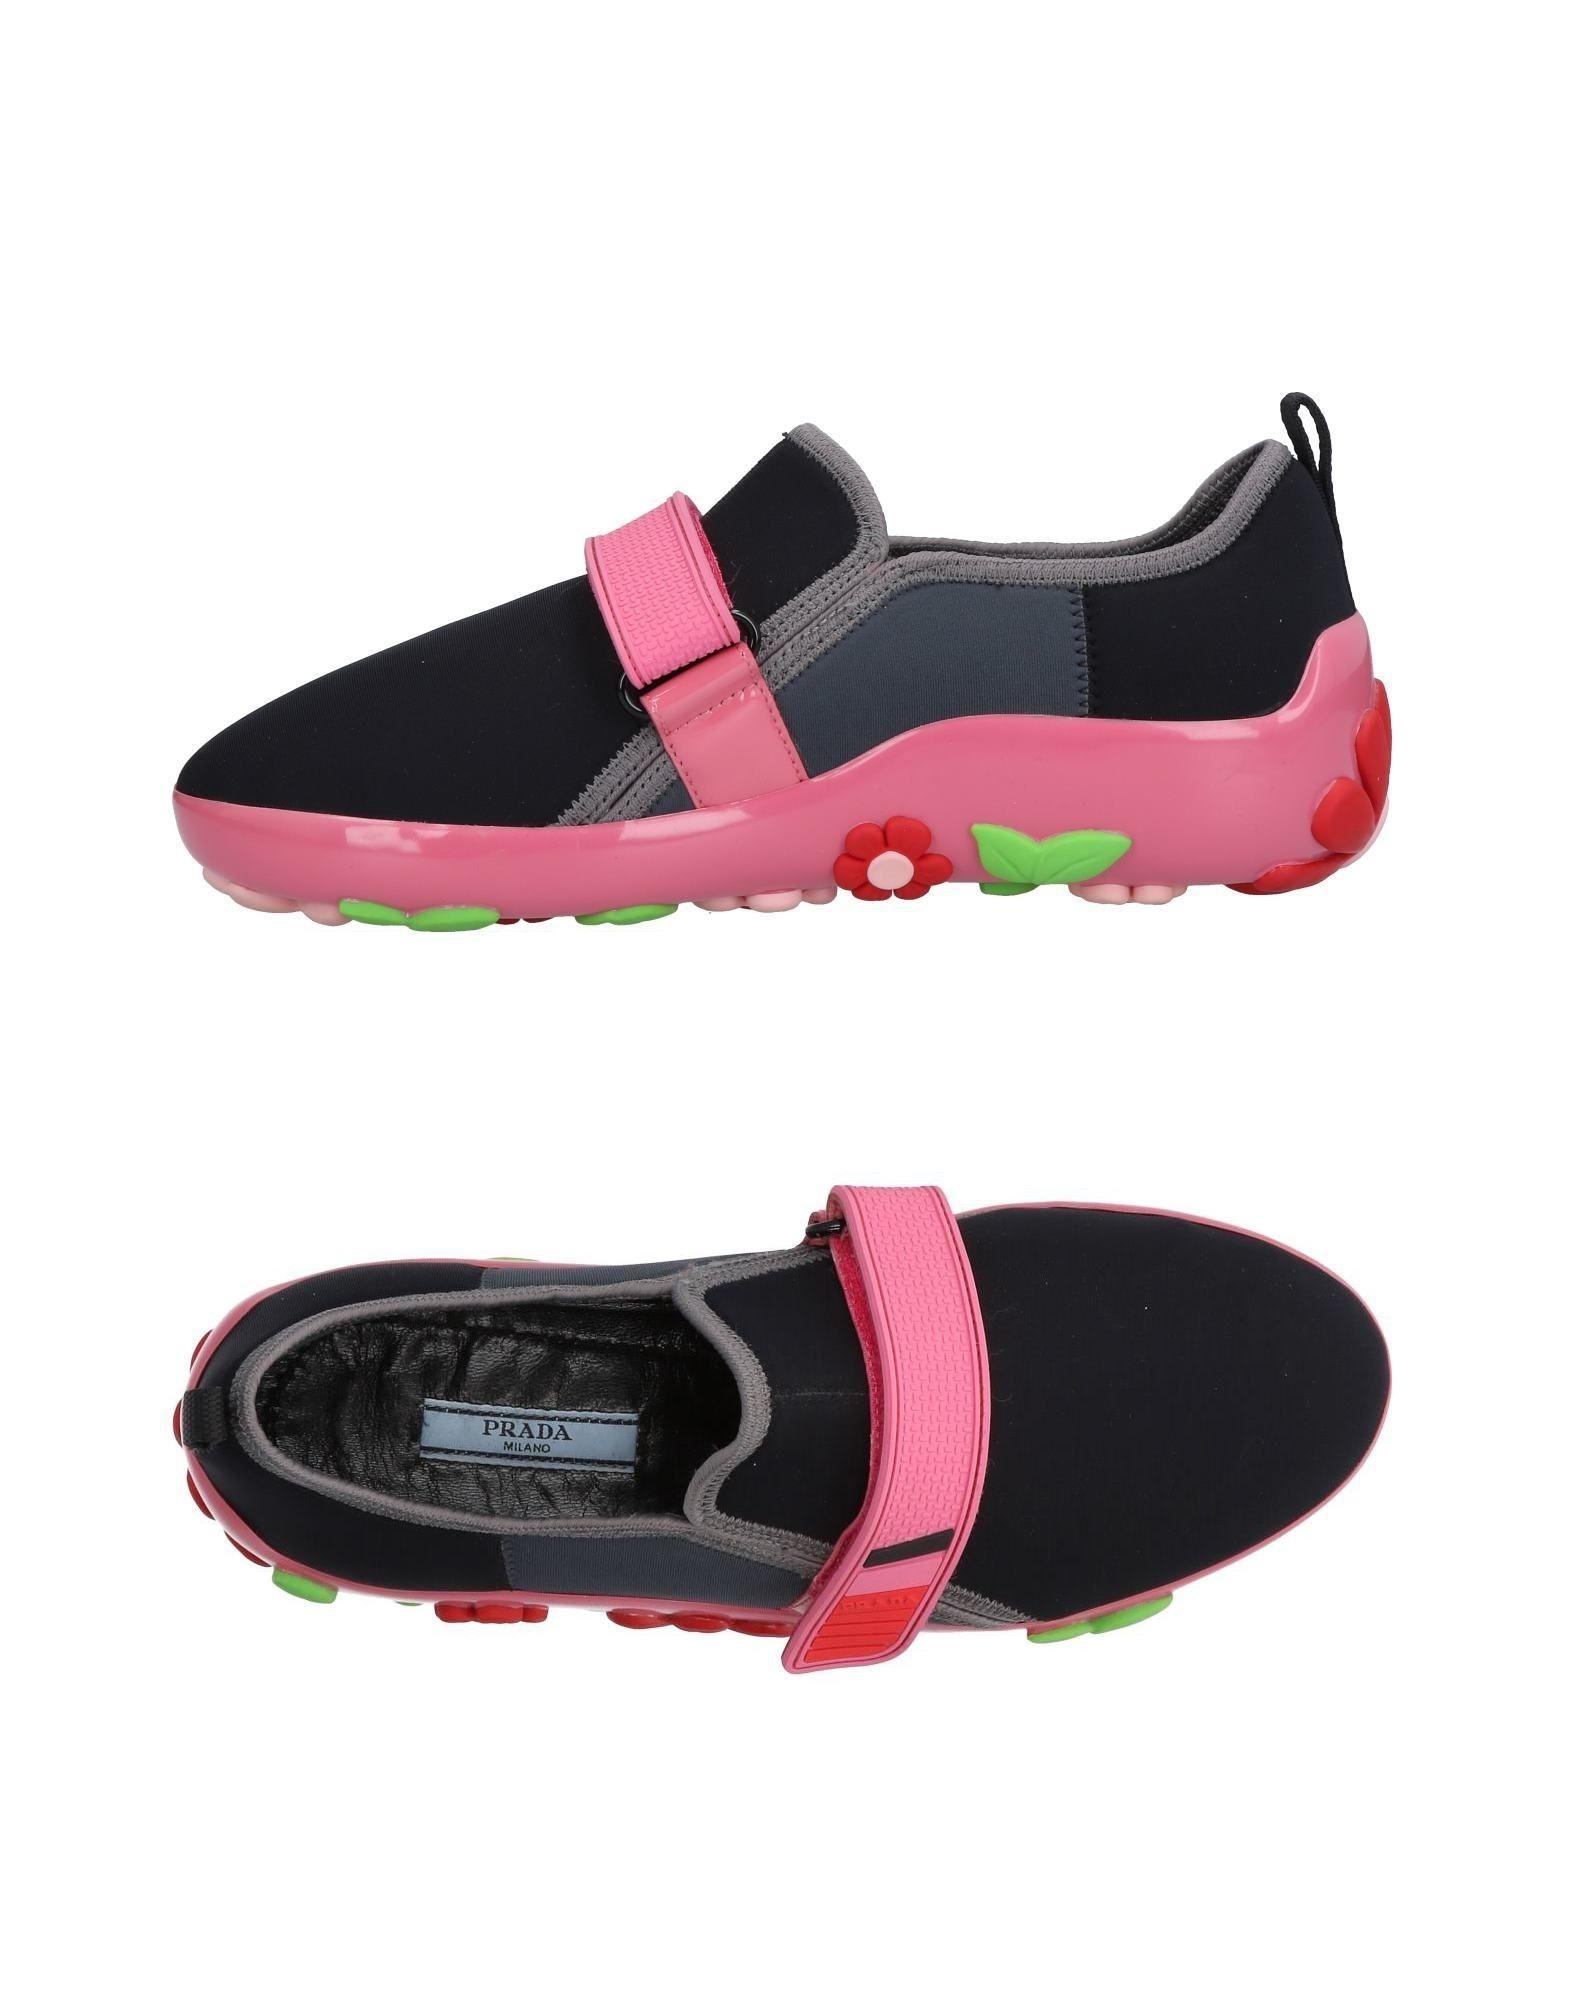 Zapatillas Prada Prada Mujer - Zapatillas Prada Zapatillas  Negro 0f3669